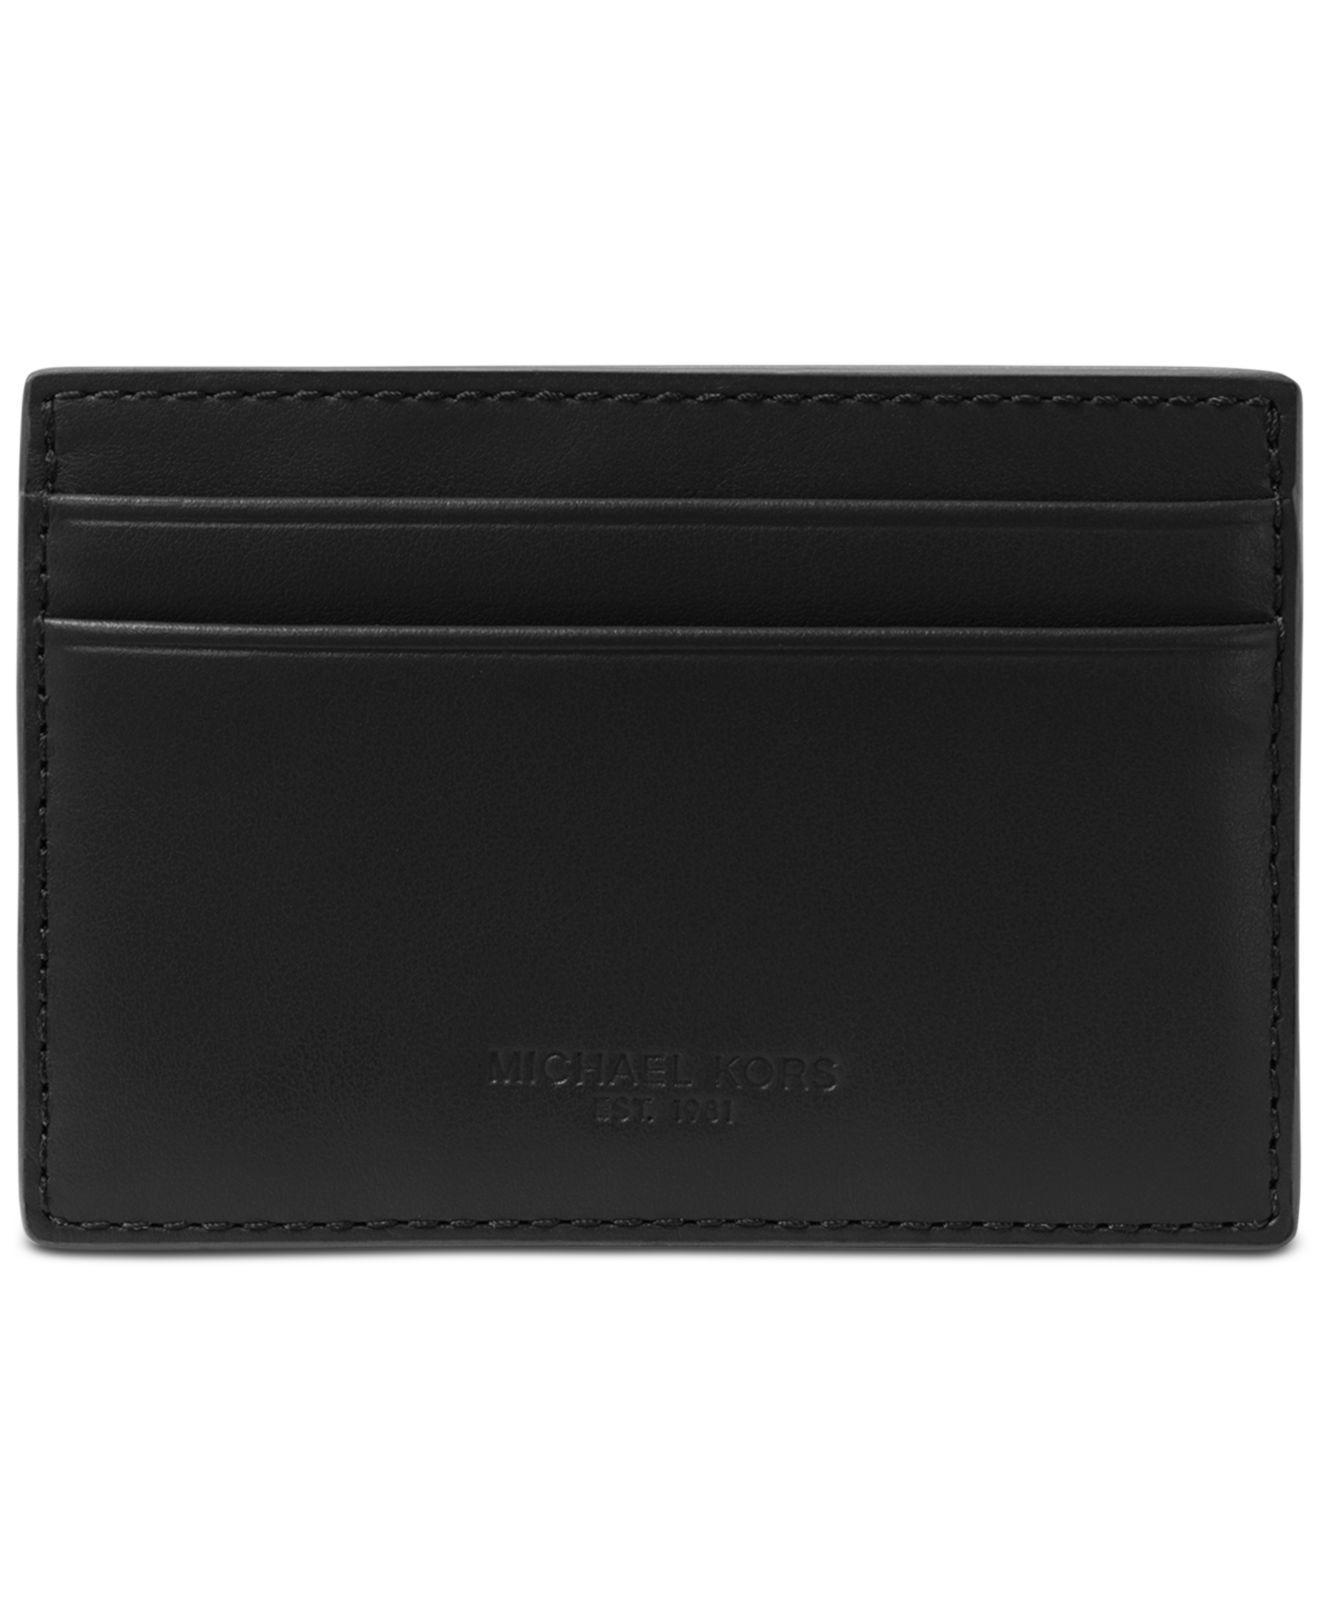 70d678eeb887e Michael Kors Odin London Leather Card Case in Black for Men - Lyst